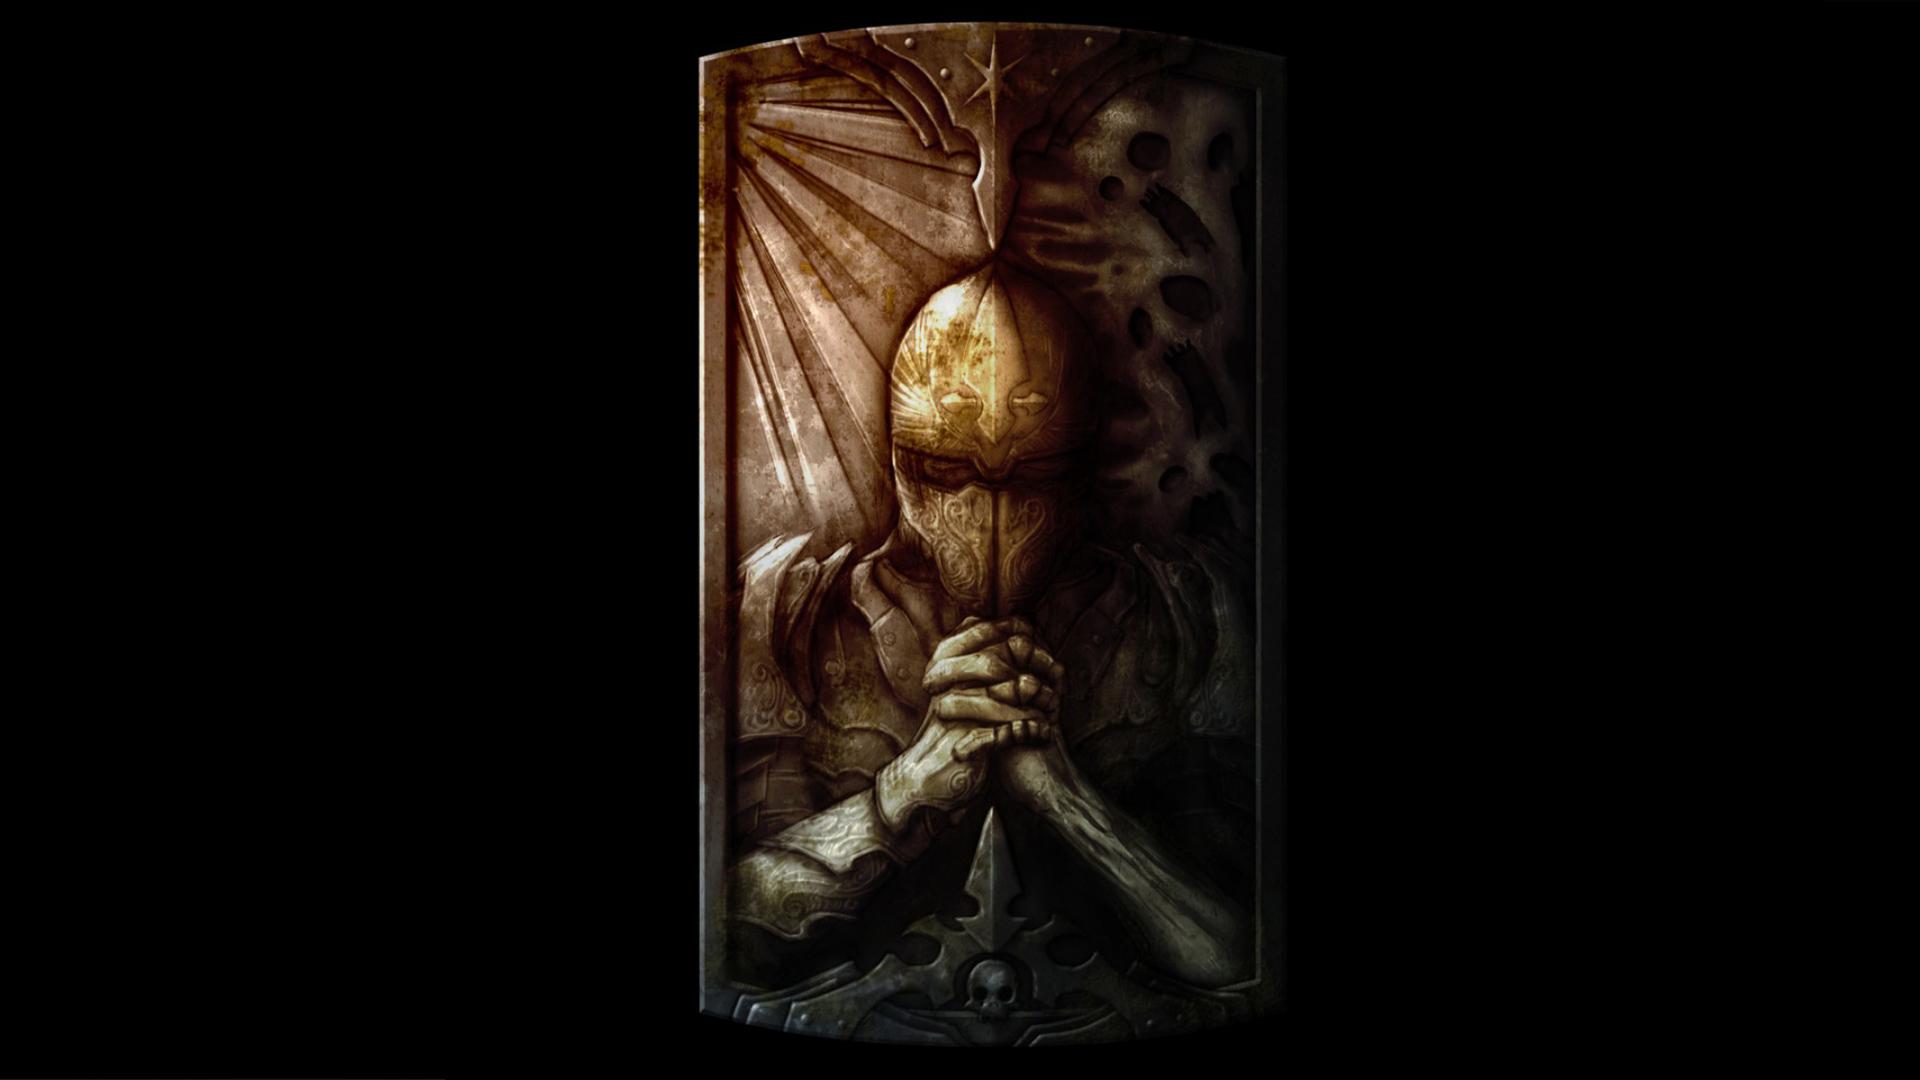 1080p Wallpaper Dark Dark souls 2 ii game hd 1920x1080